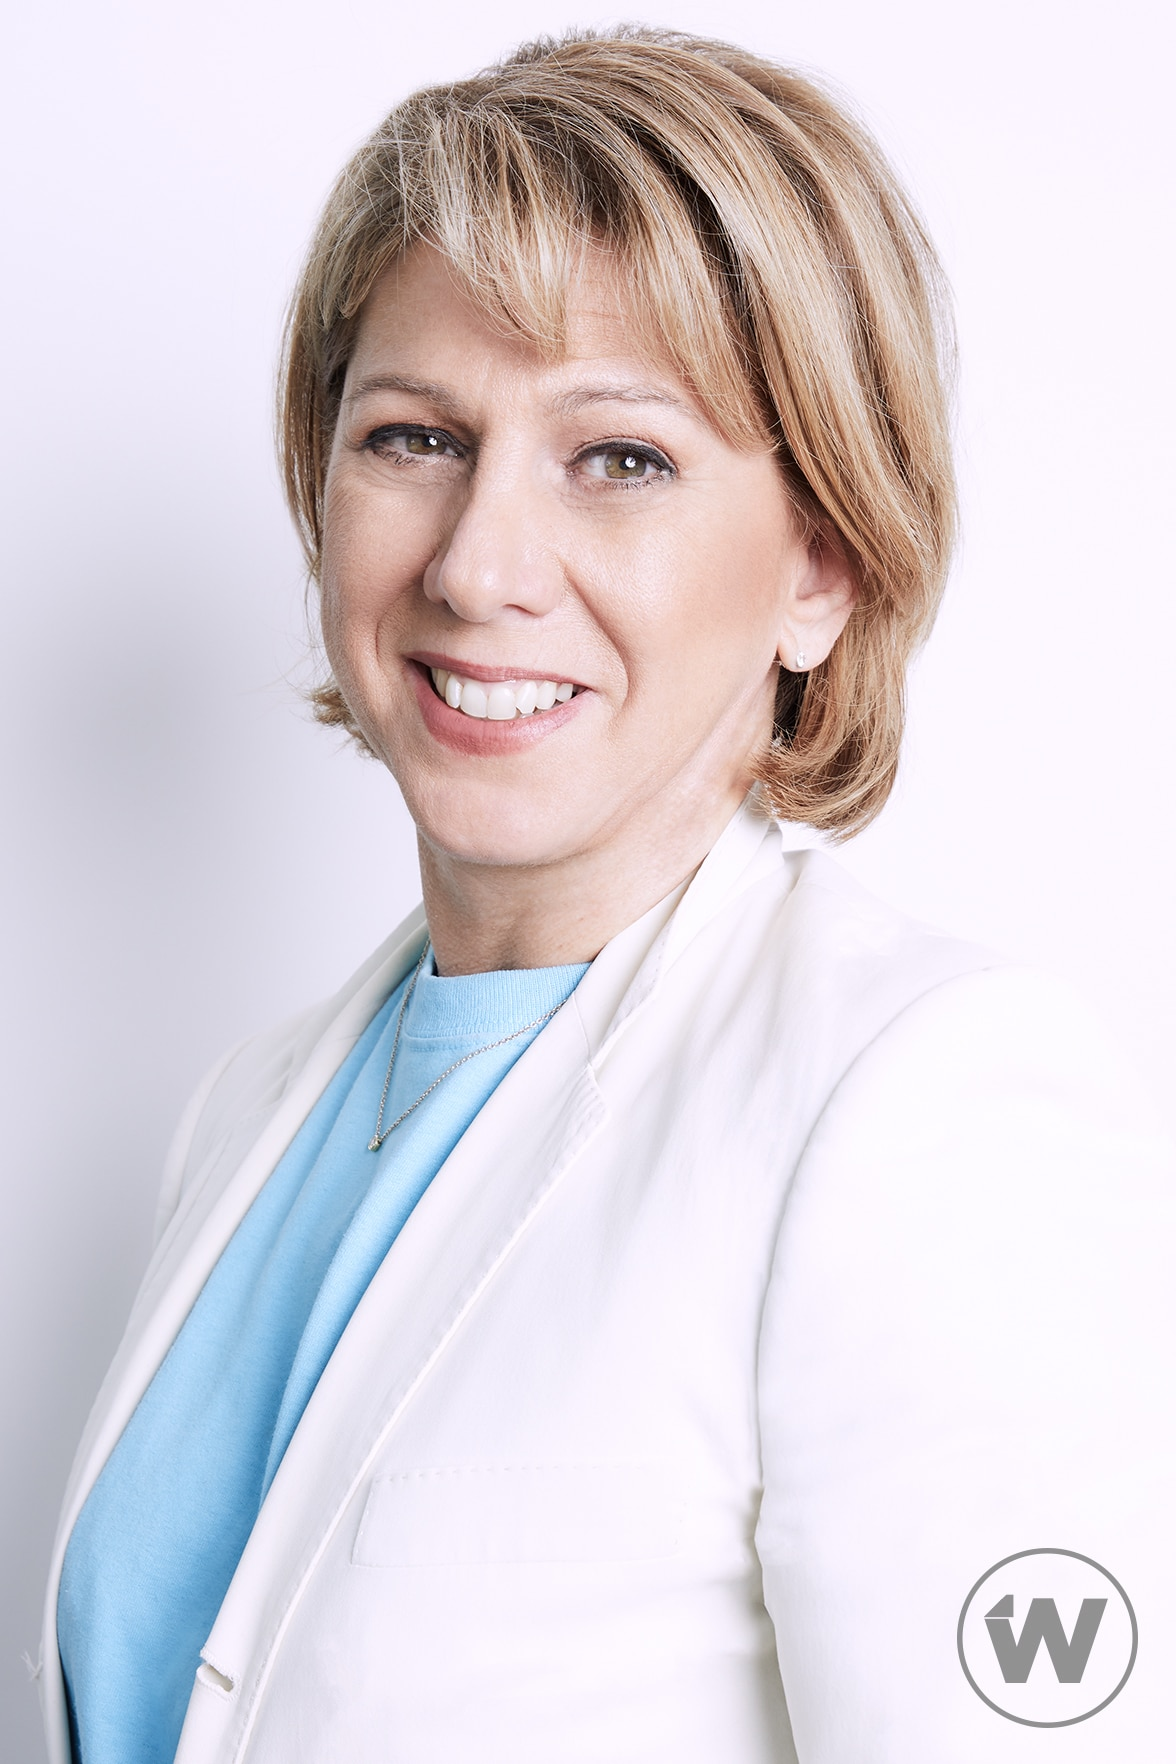 Sharon Waxman, BE Conference